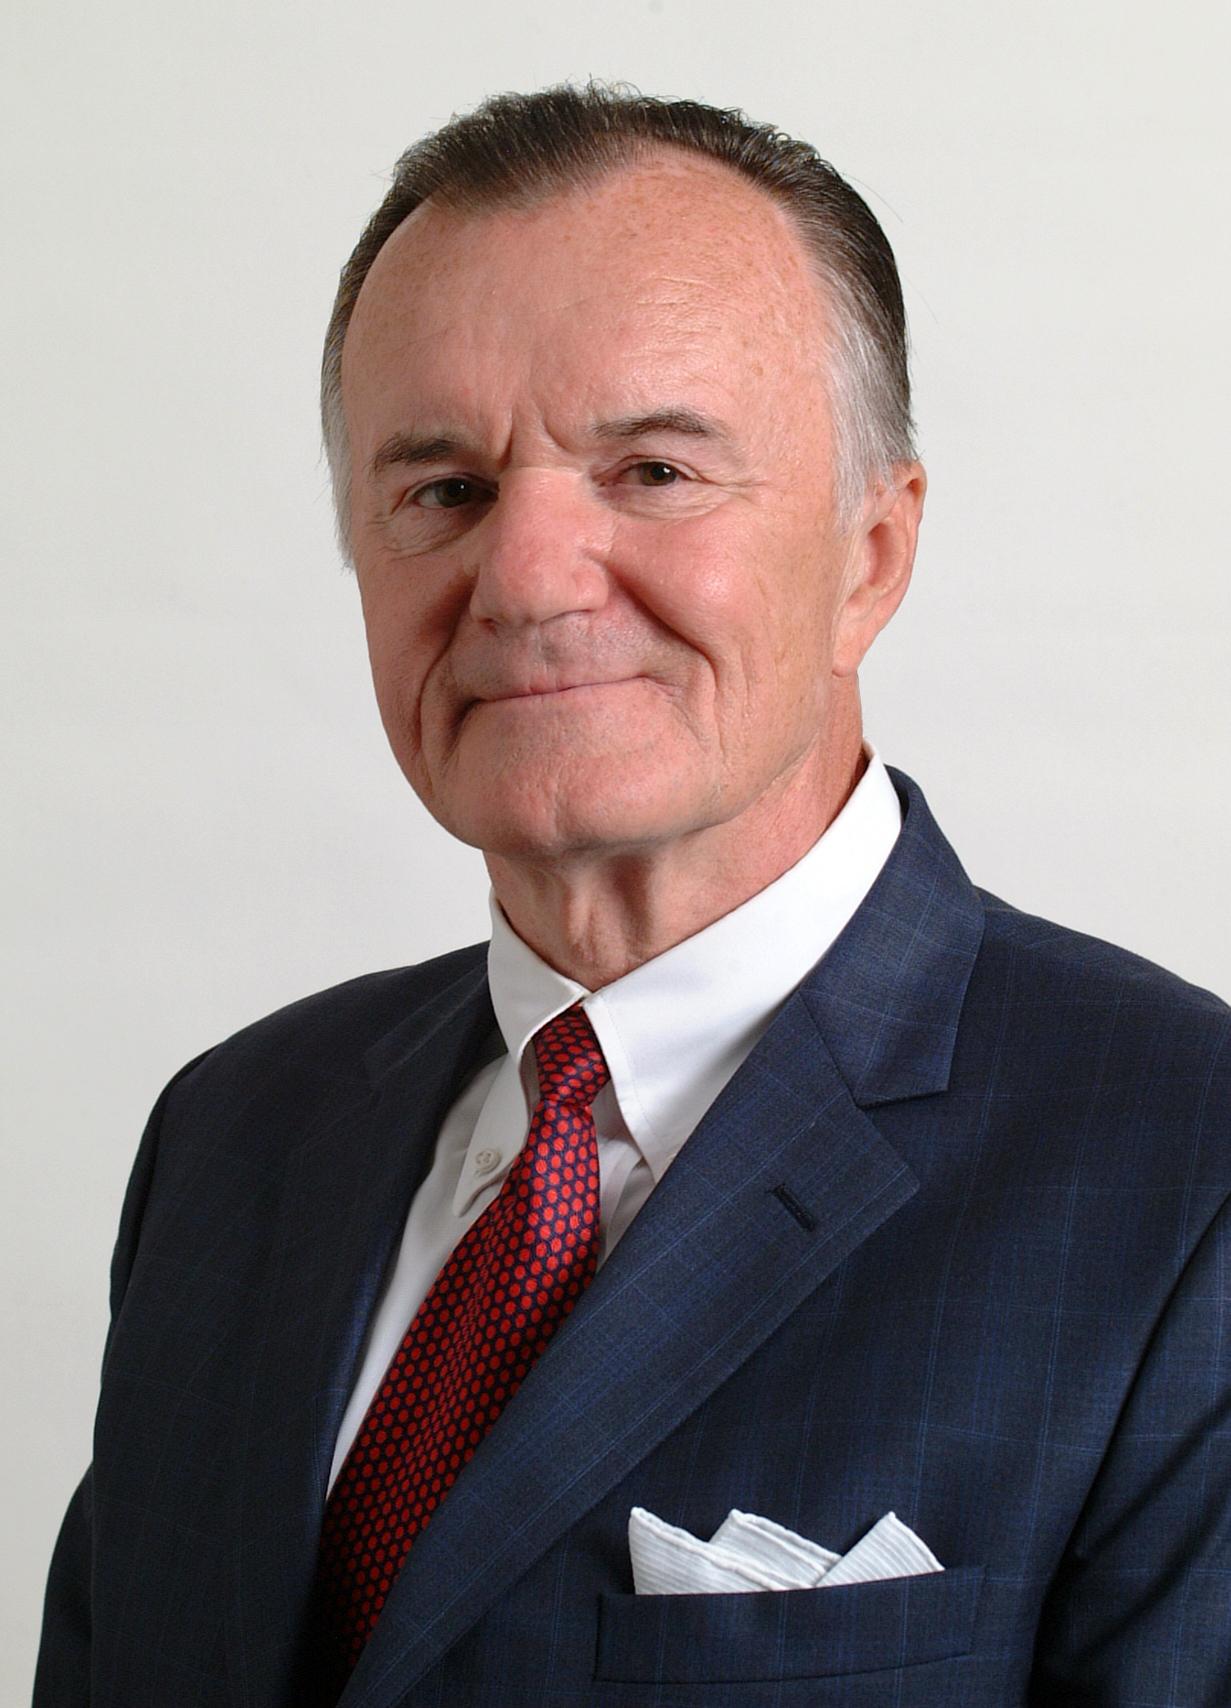 Tony Golobic  Chairman/CEO, GreatAmerica Financial Services